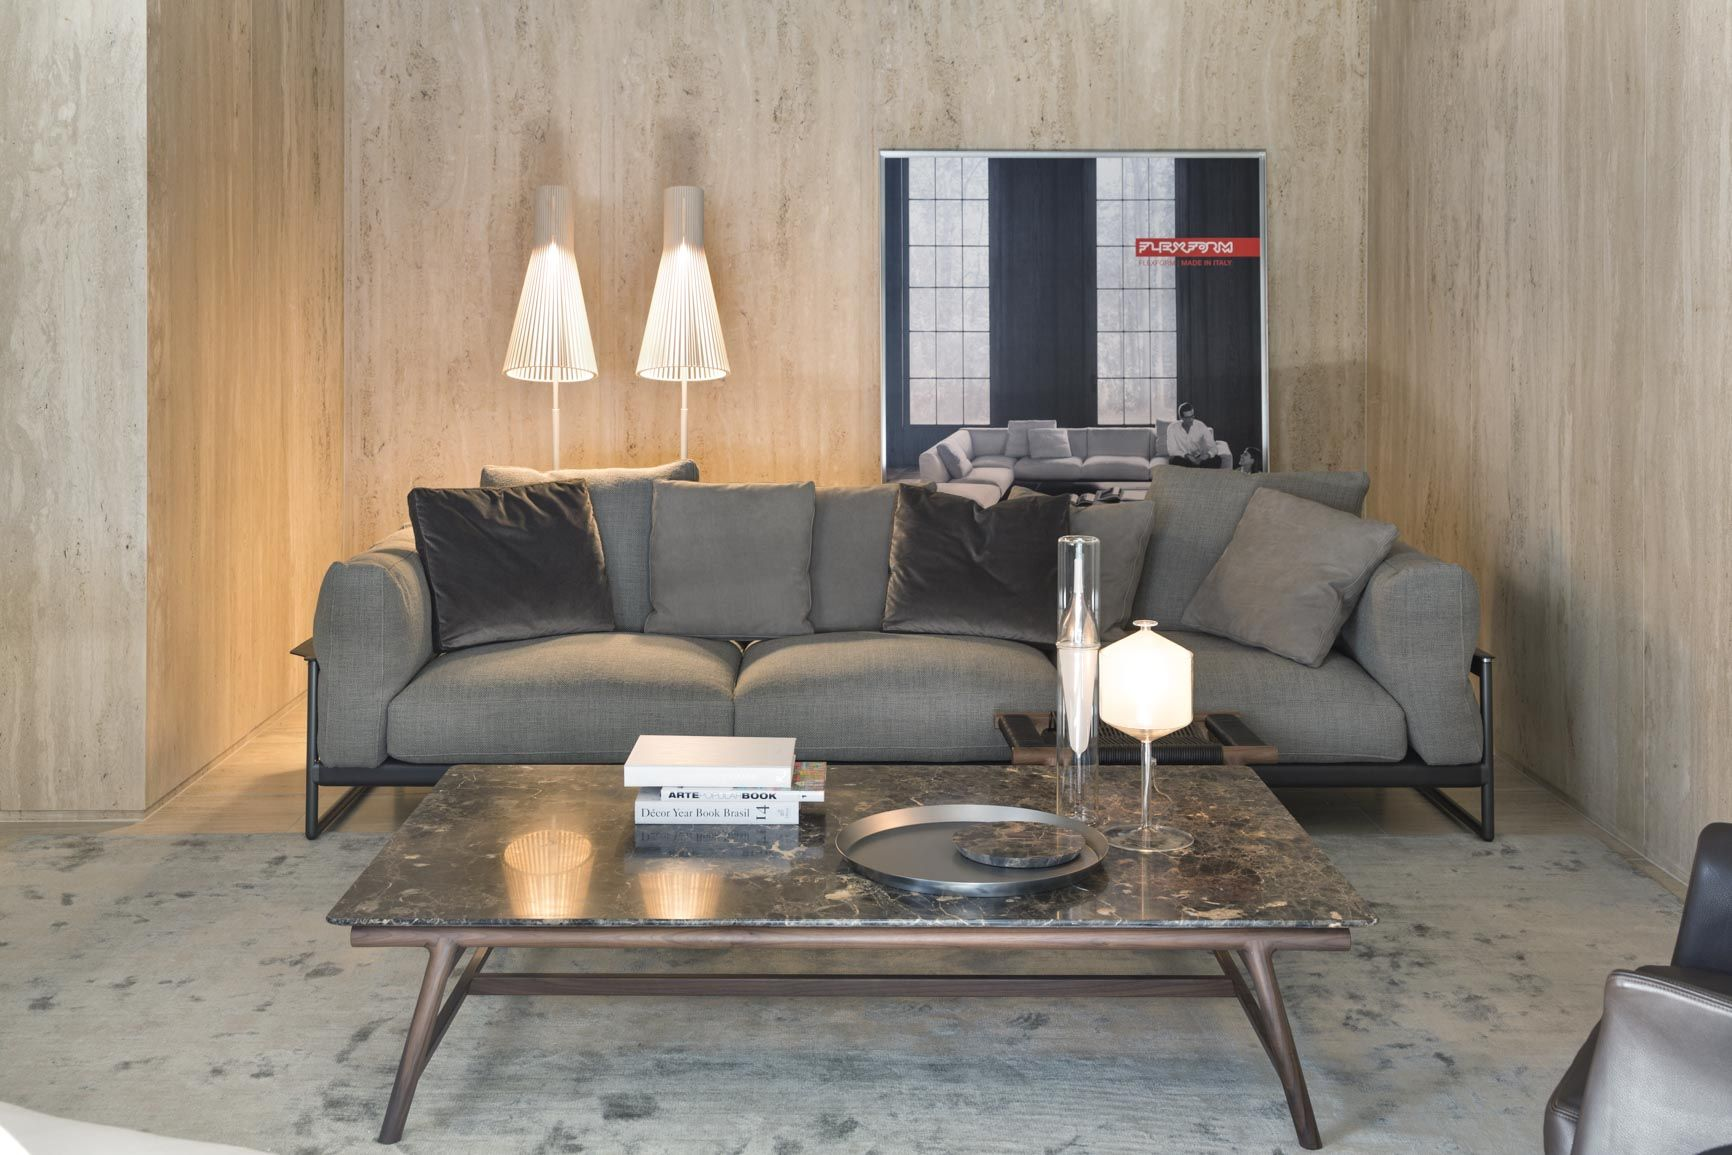 2017 New Opening Flexform Zeno Light Sofa Giano Small Tables  # Muebles Di Giano